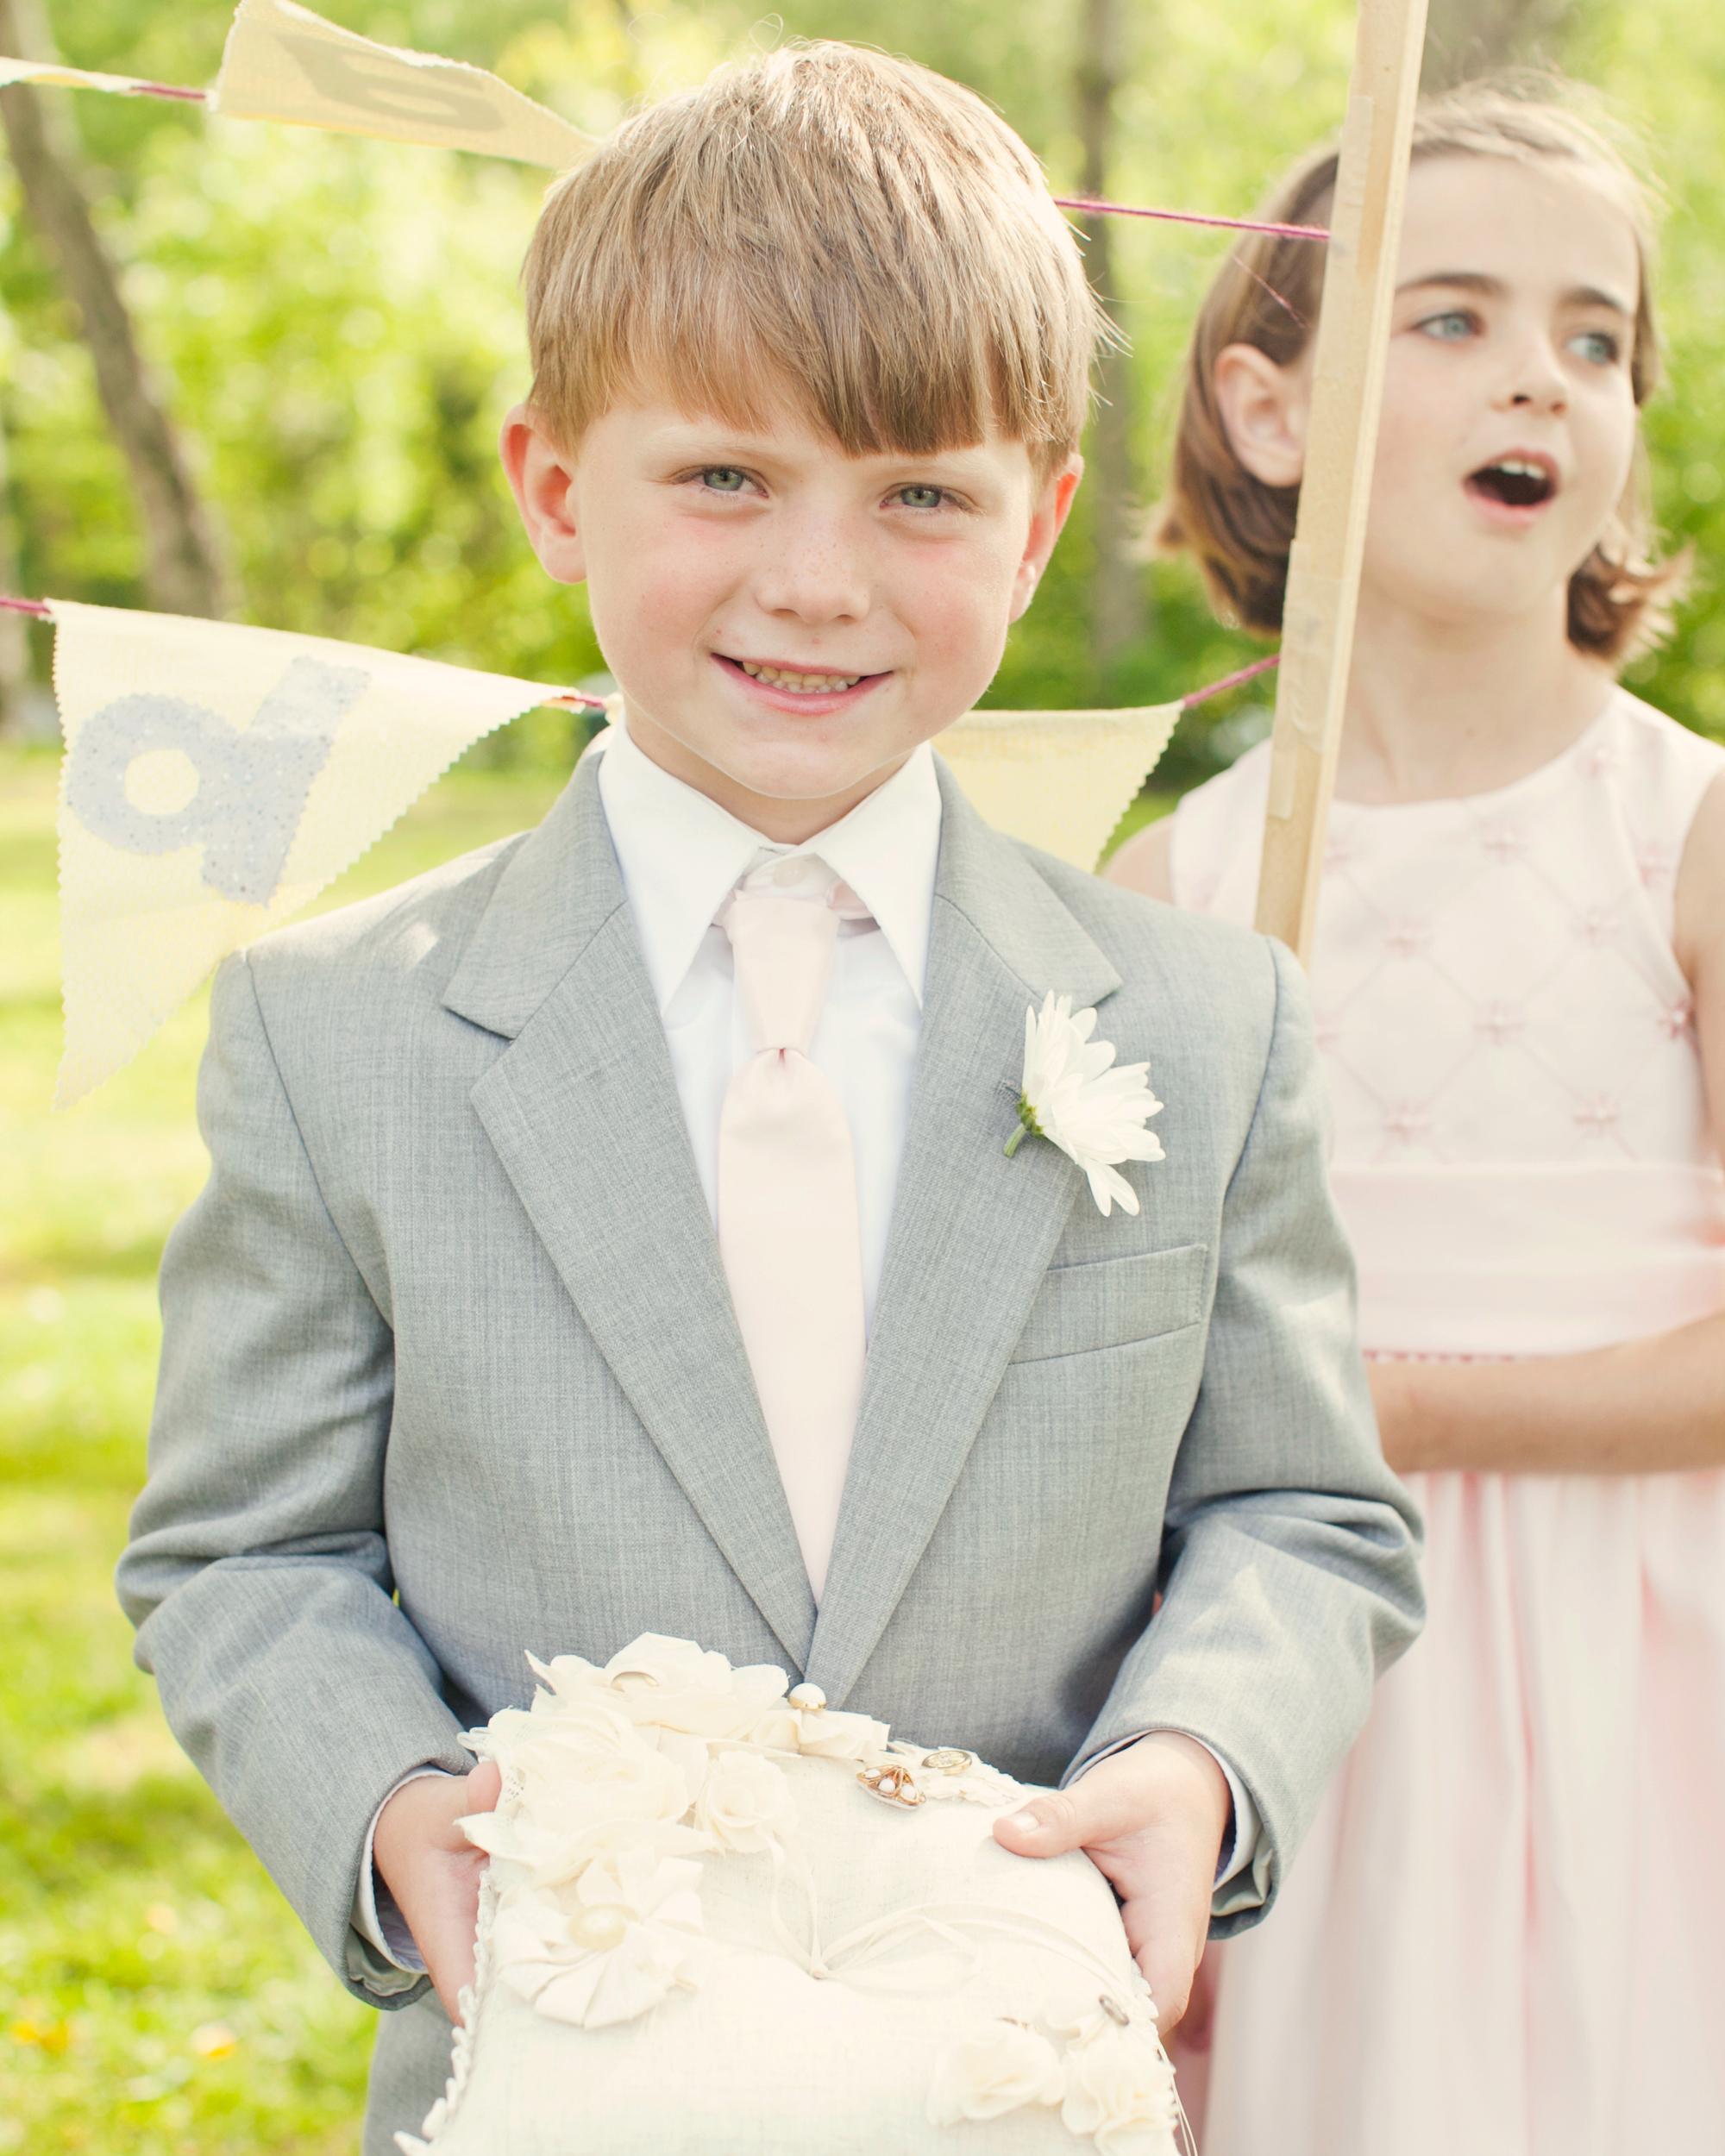 real-weddings-abby-julian-0711-264.jpg